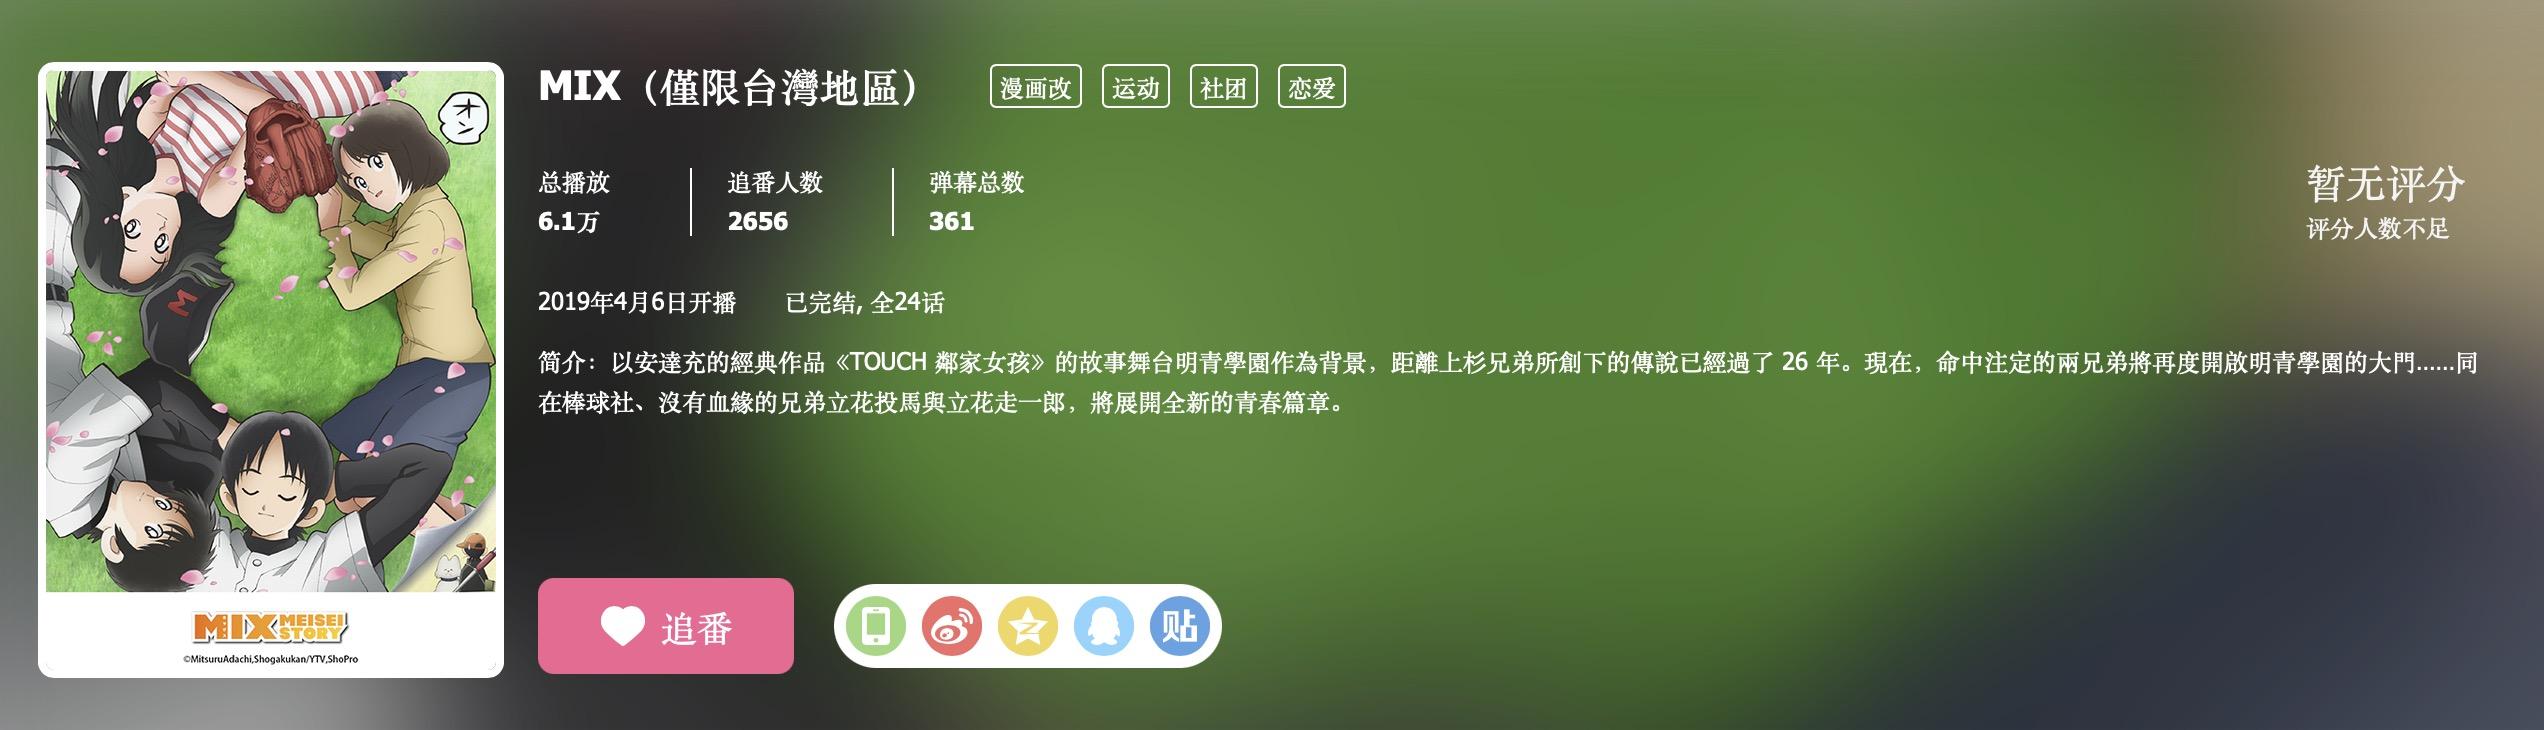 CleanShot 2020-12-30 at 09.48.28@2x.jpg